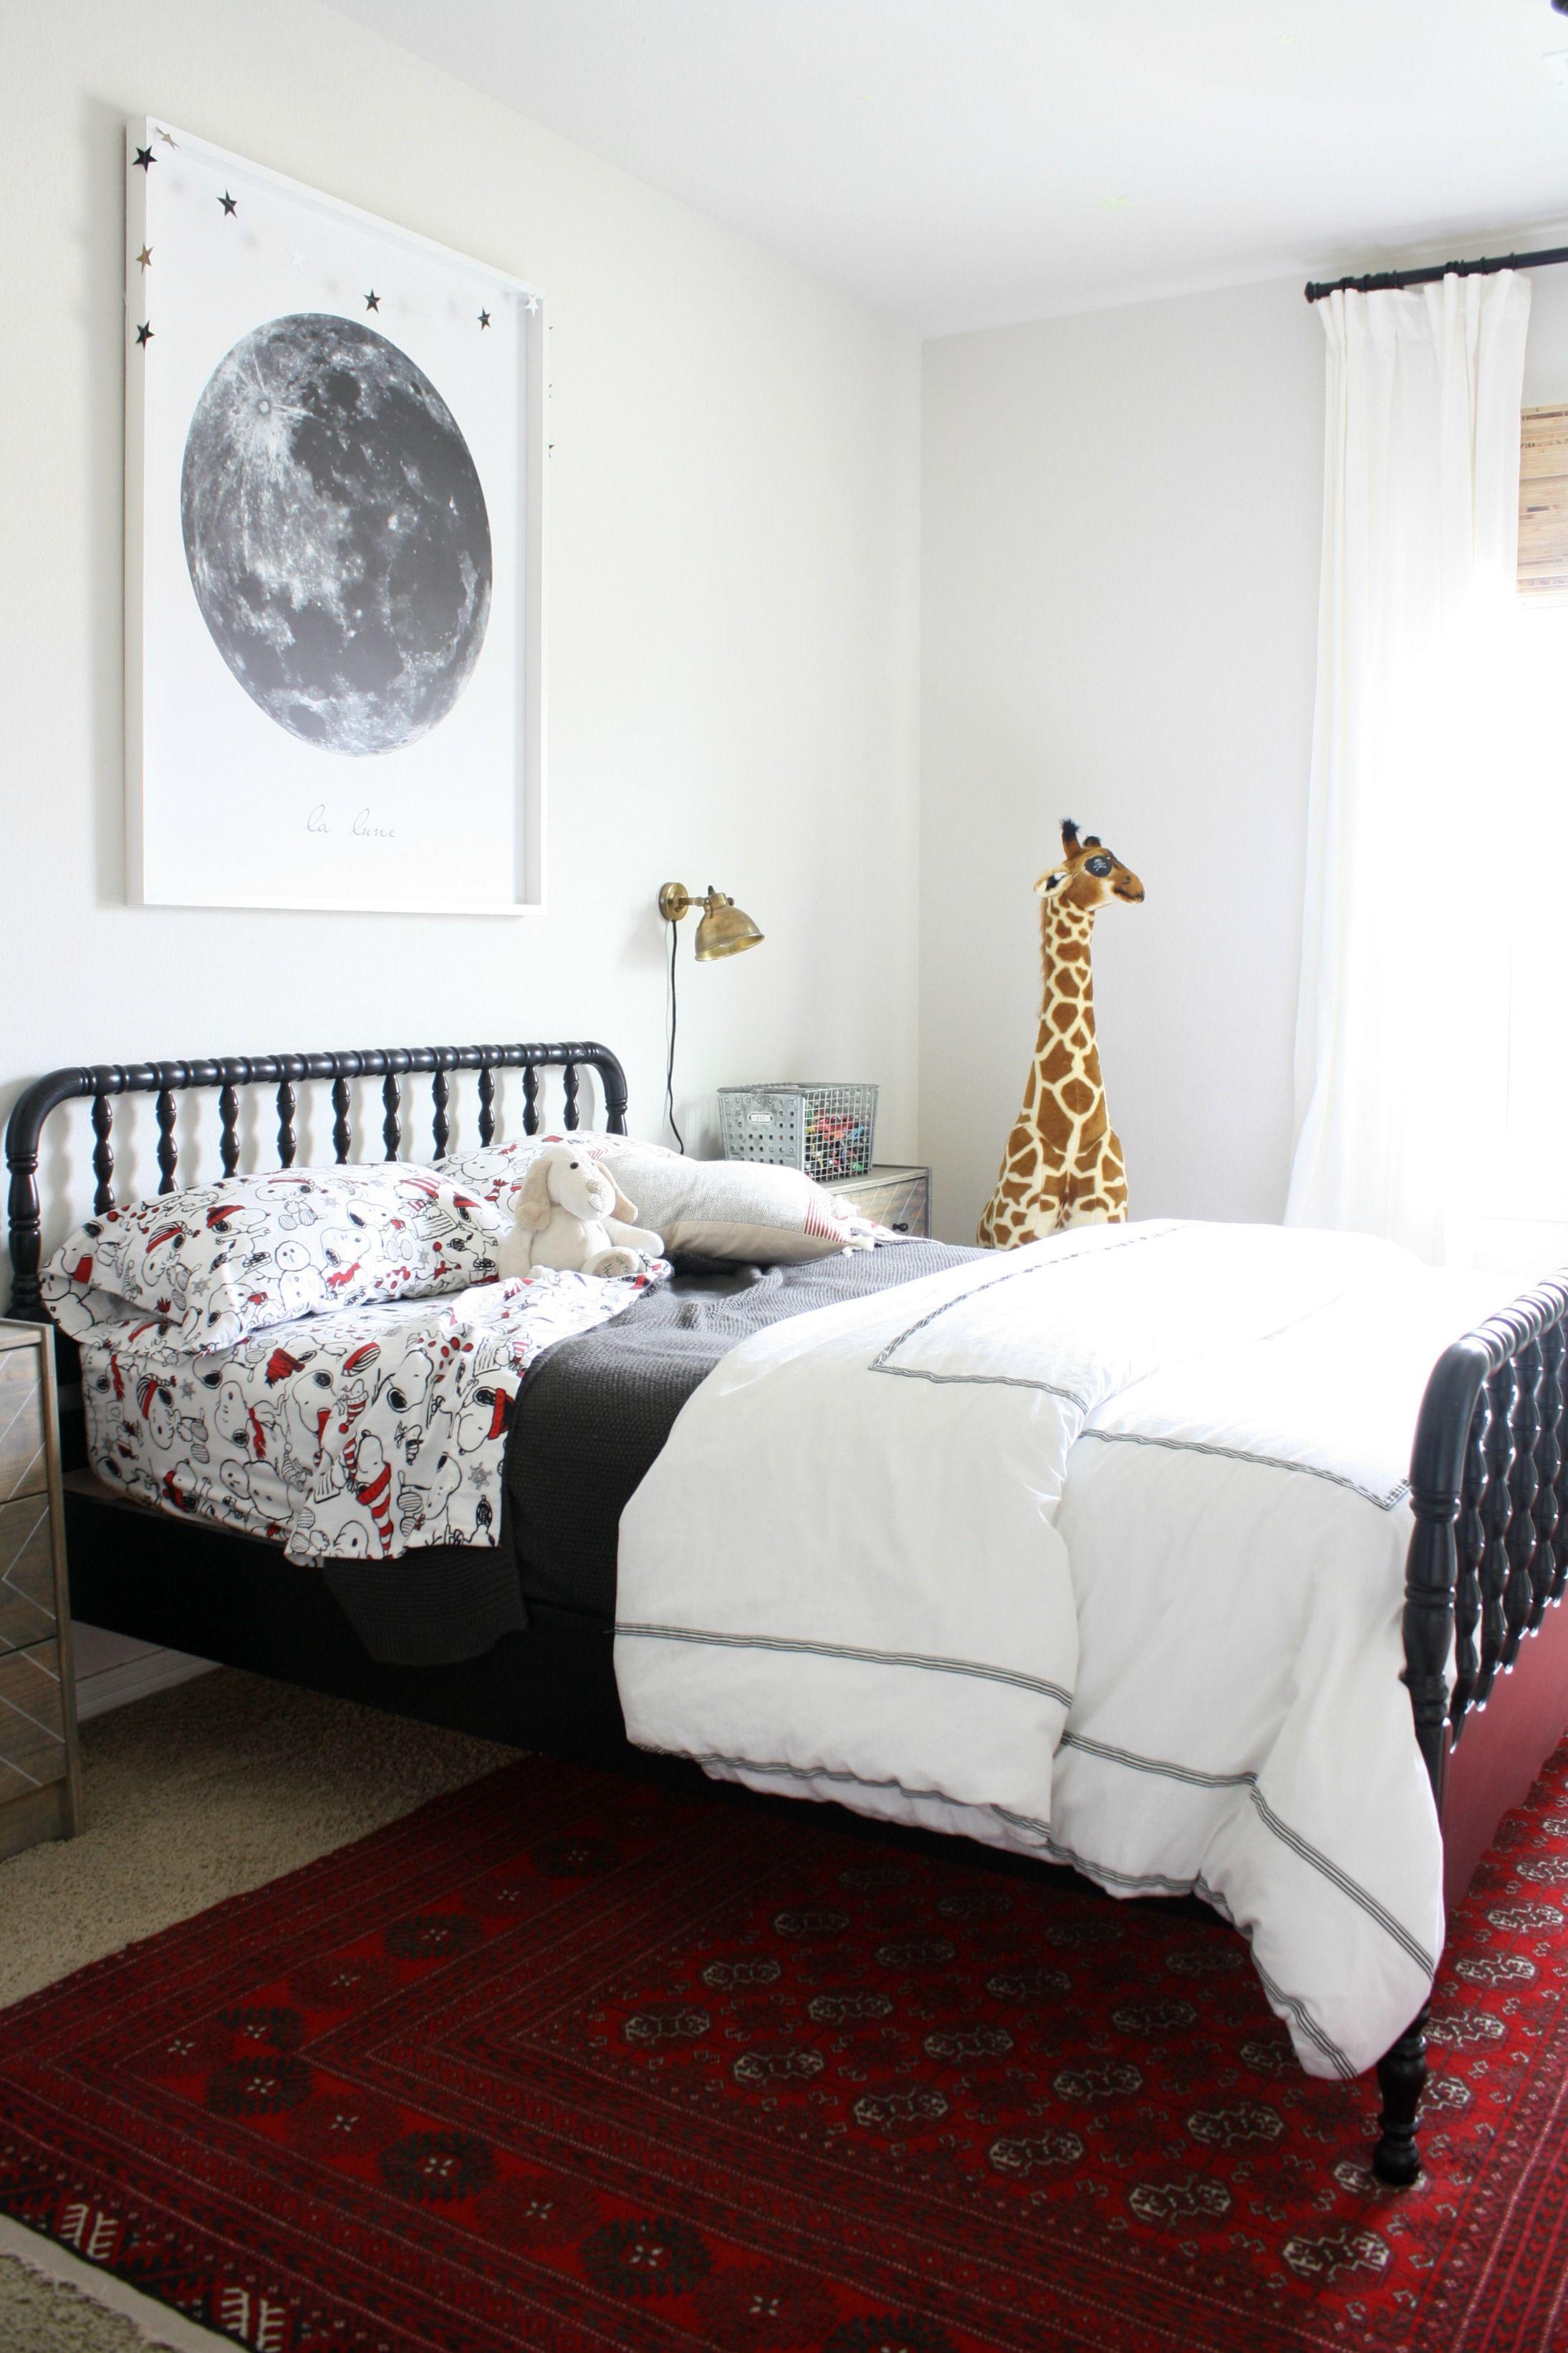 Flannel Sheets For The Kids Crazy Wonderful Blog Jenny Lind Bed